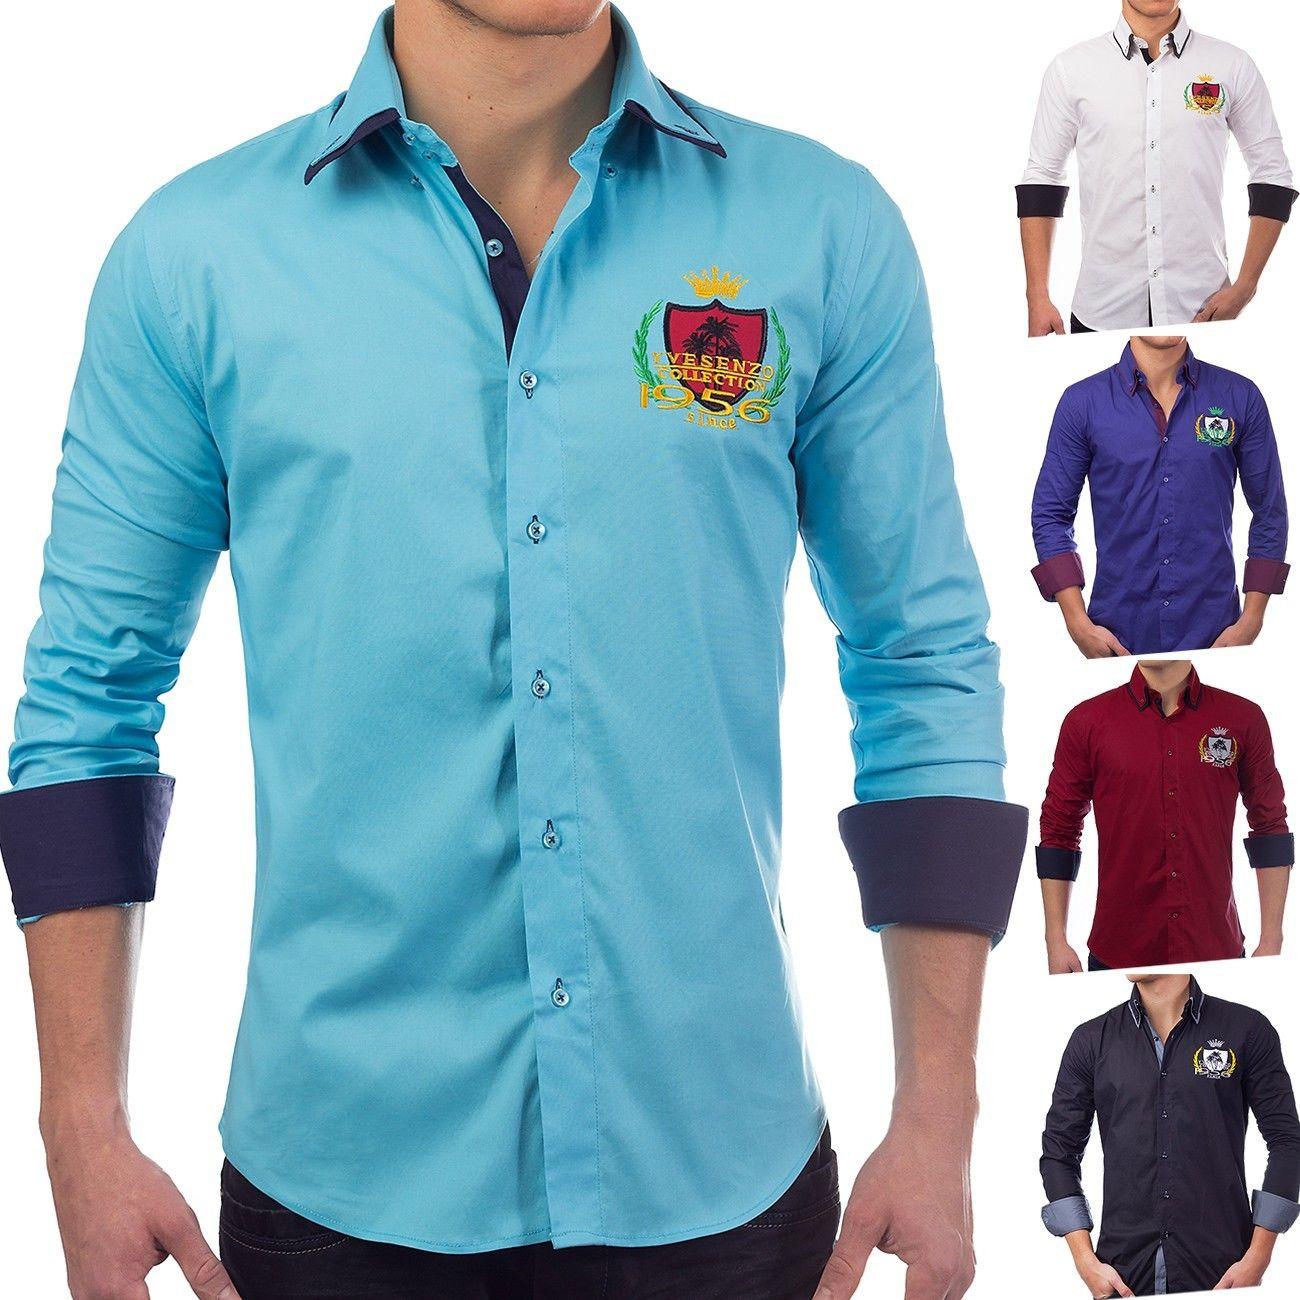 Herren Hemd langarm Polo Shirt SlimFit Patches Freizeithemd Casual(5 Farben)